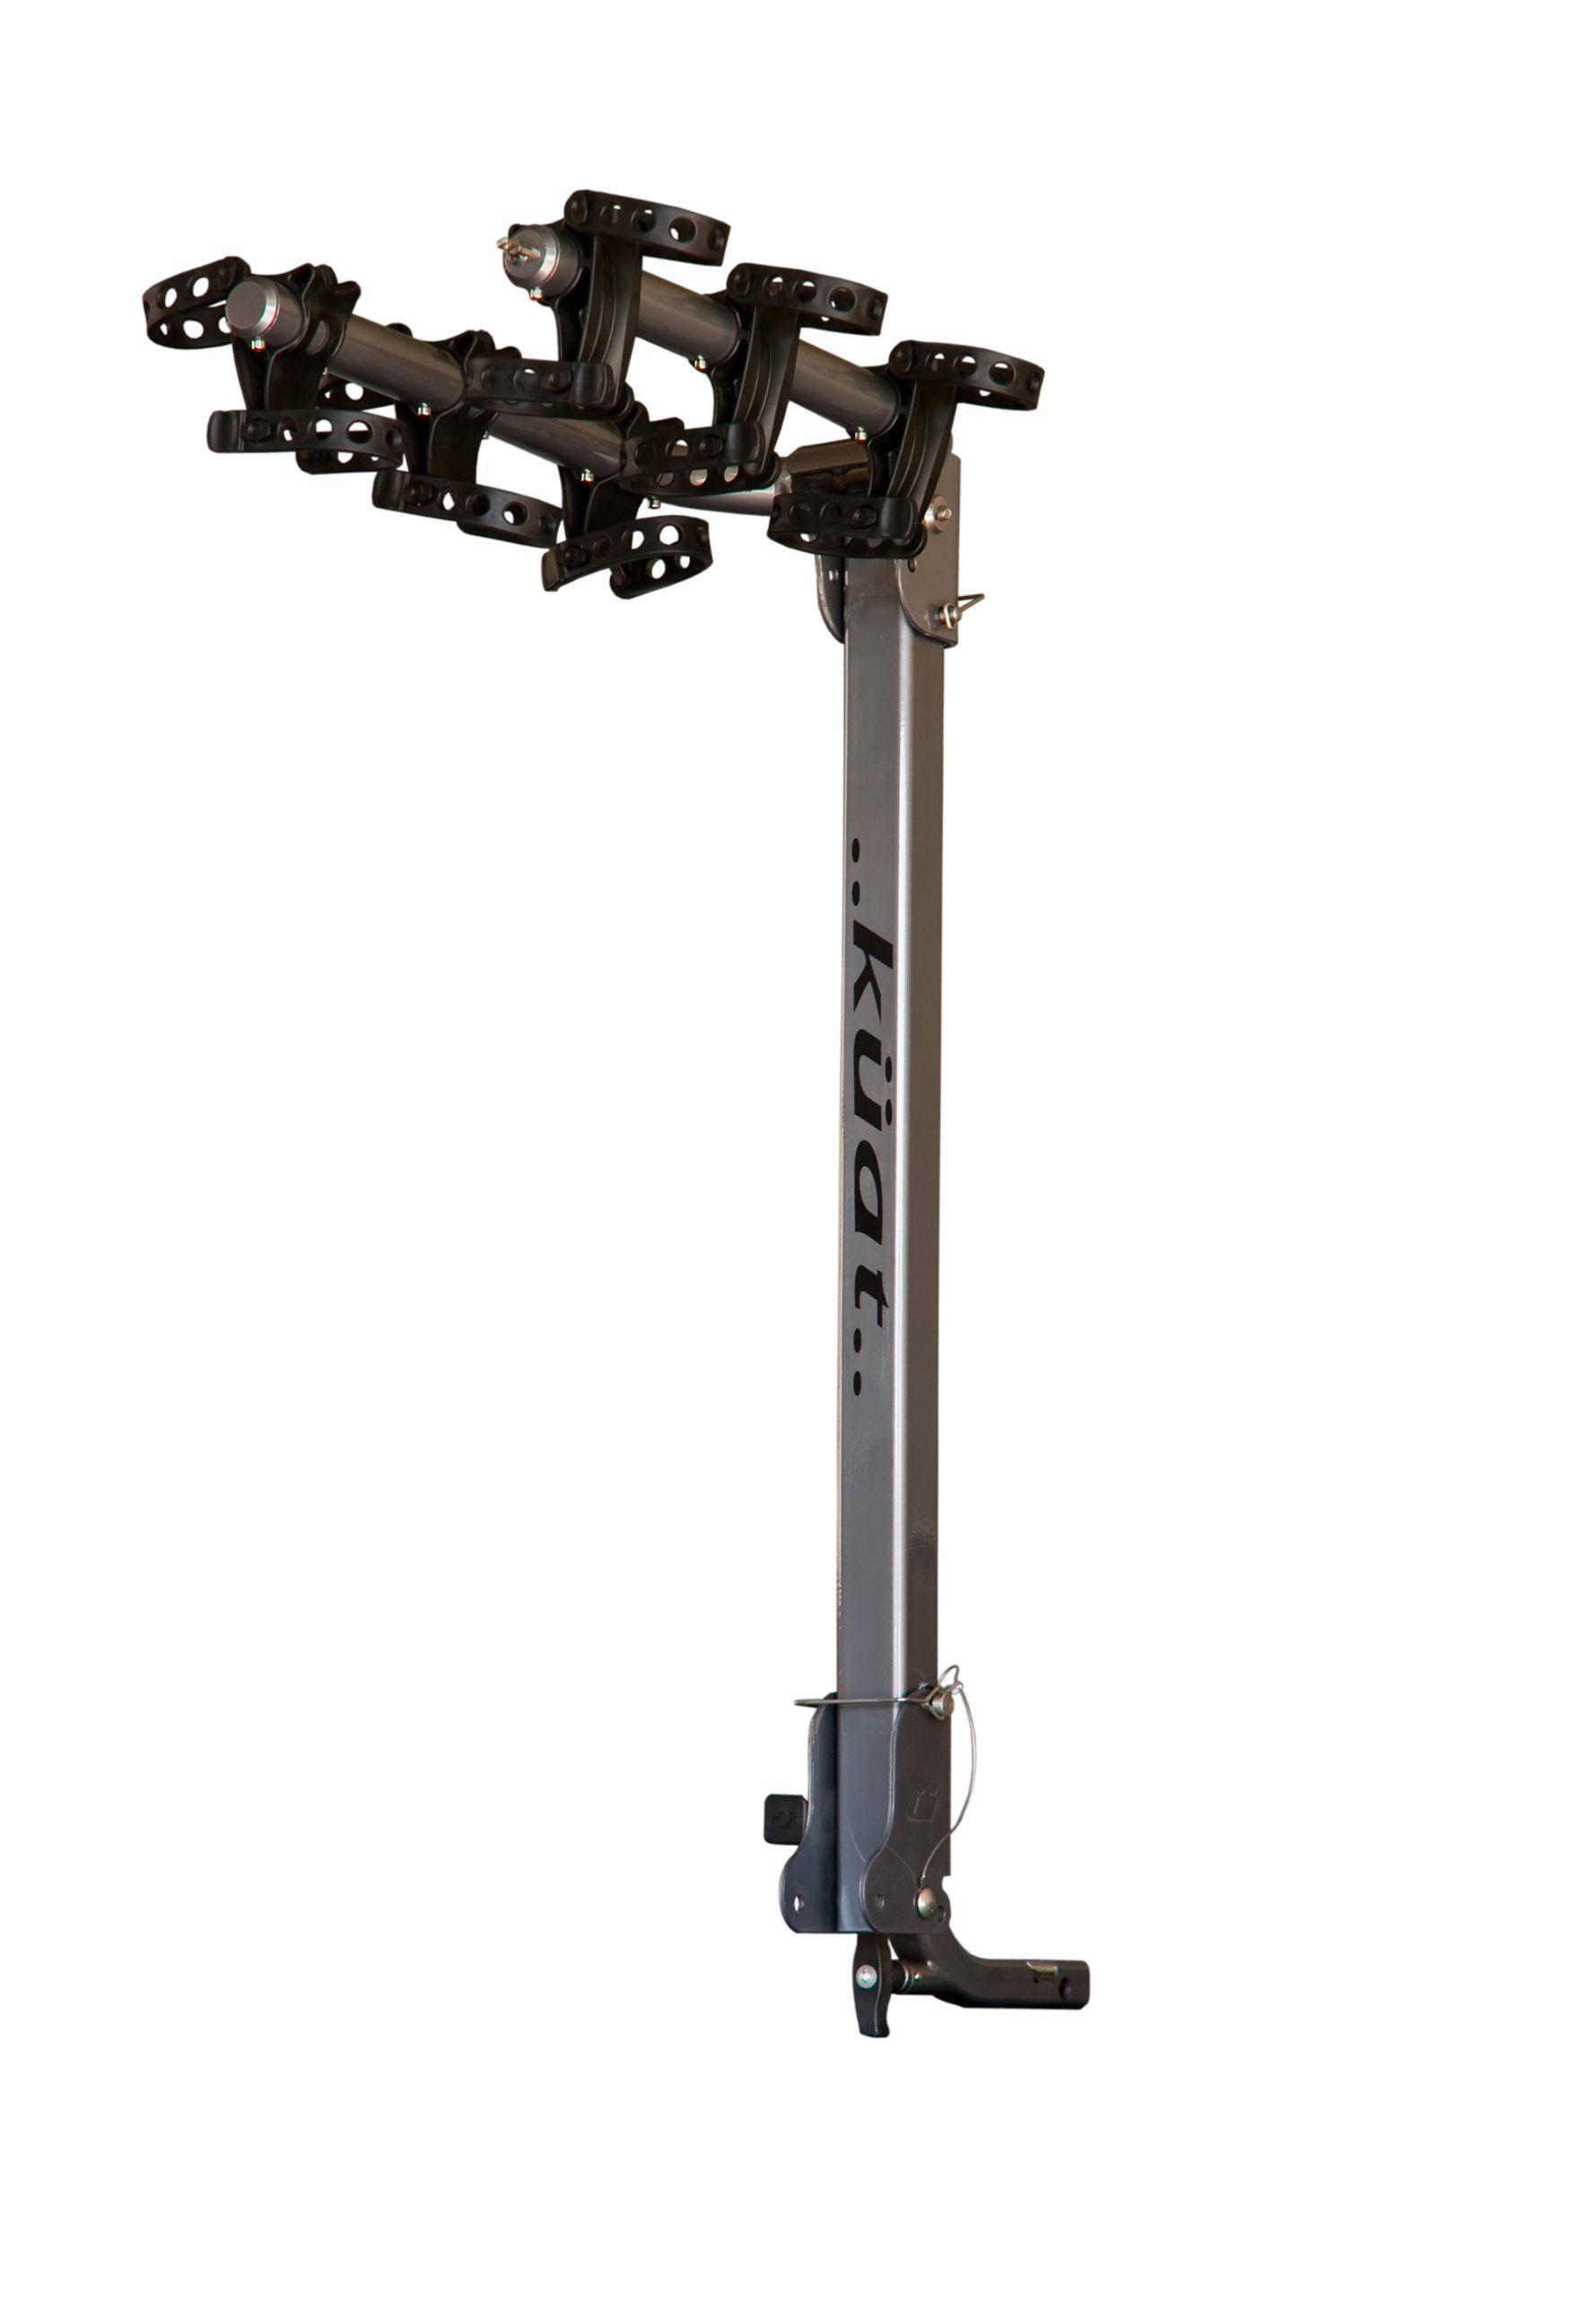 community sale transfer cool full kuat bike review of bikes fans forum parts ford for gool racks rack base size truck